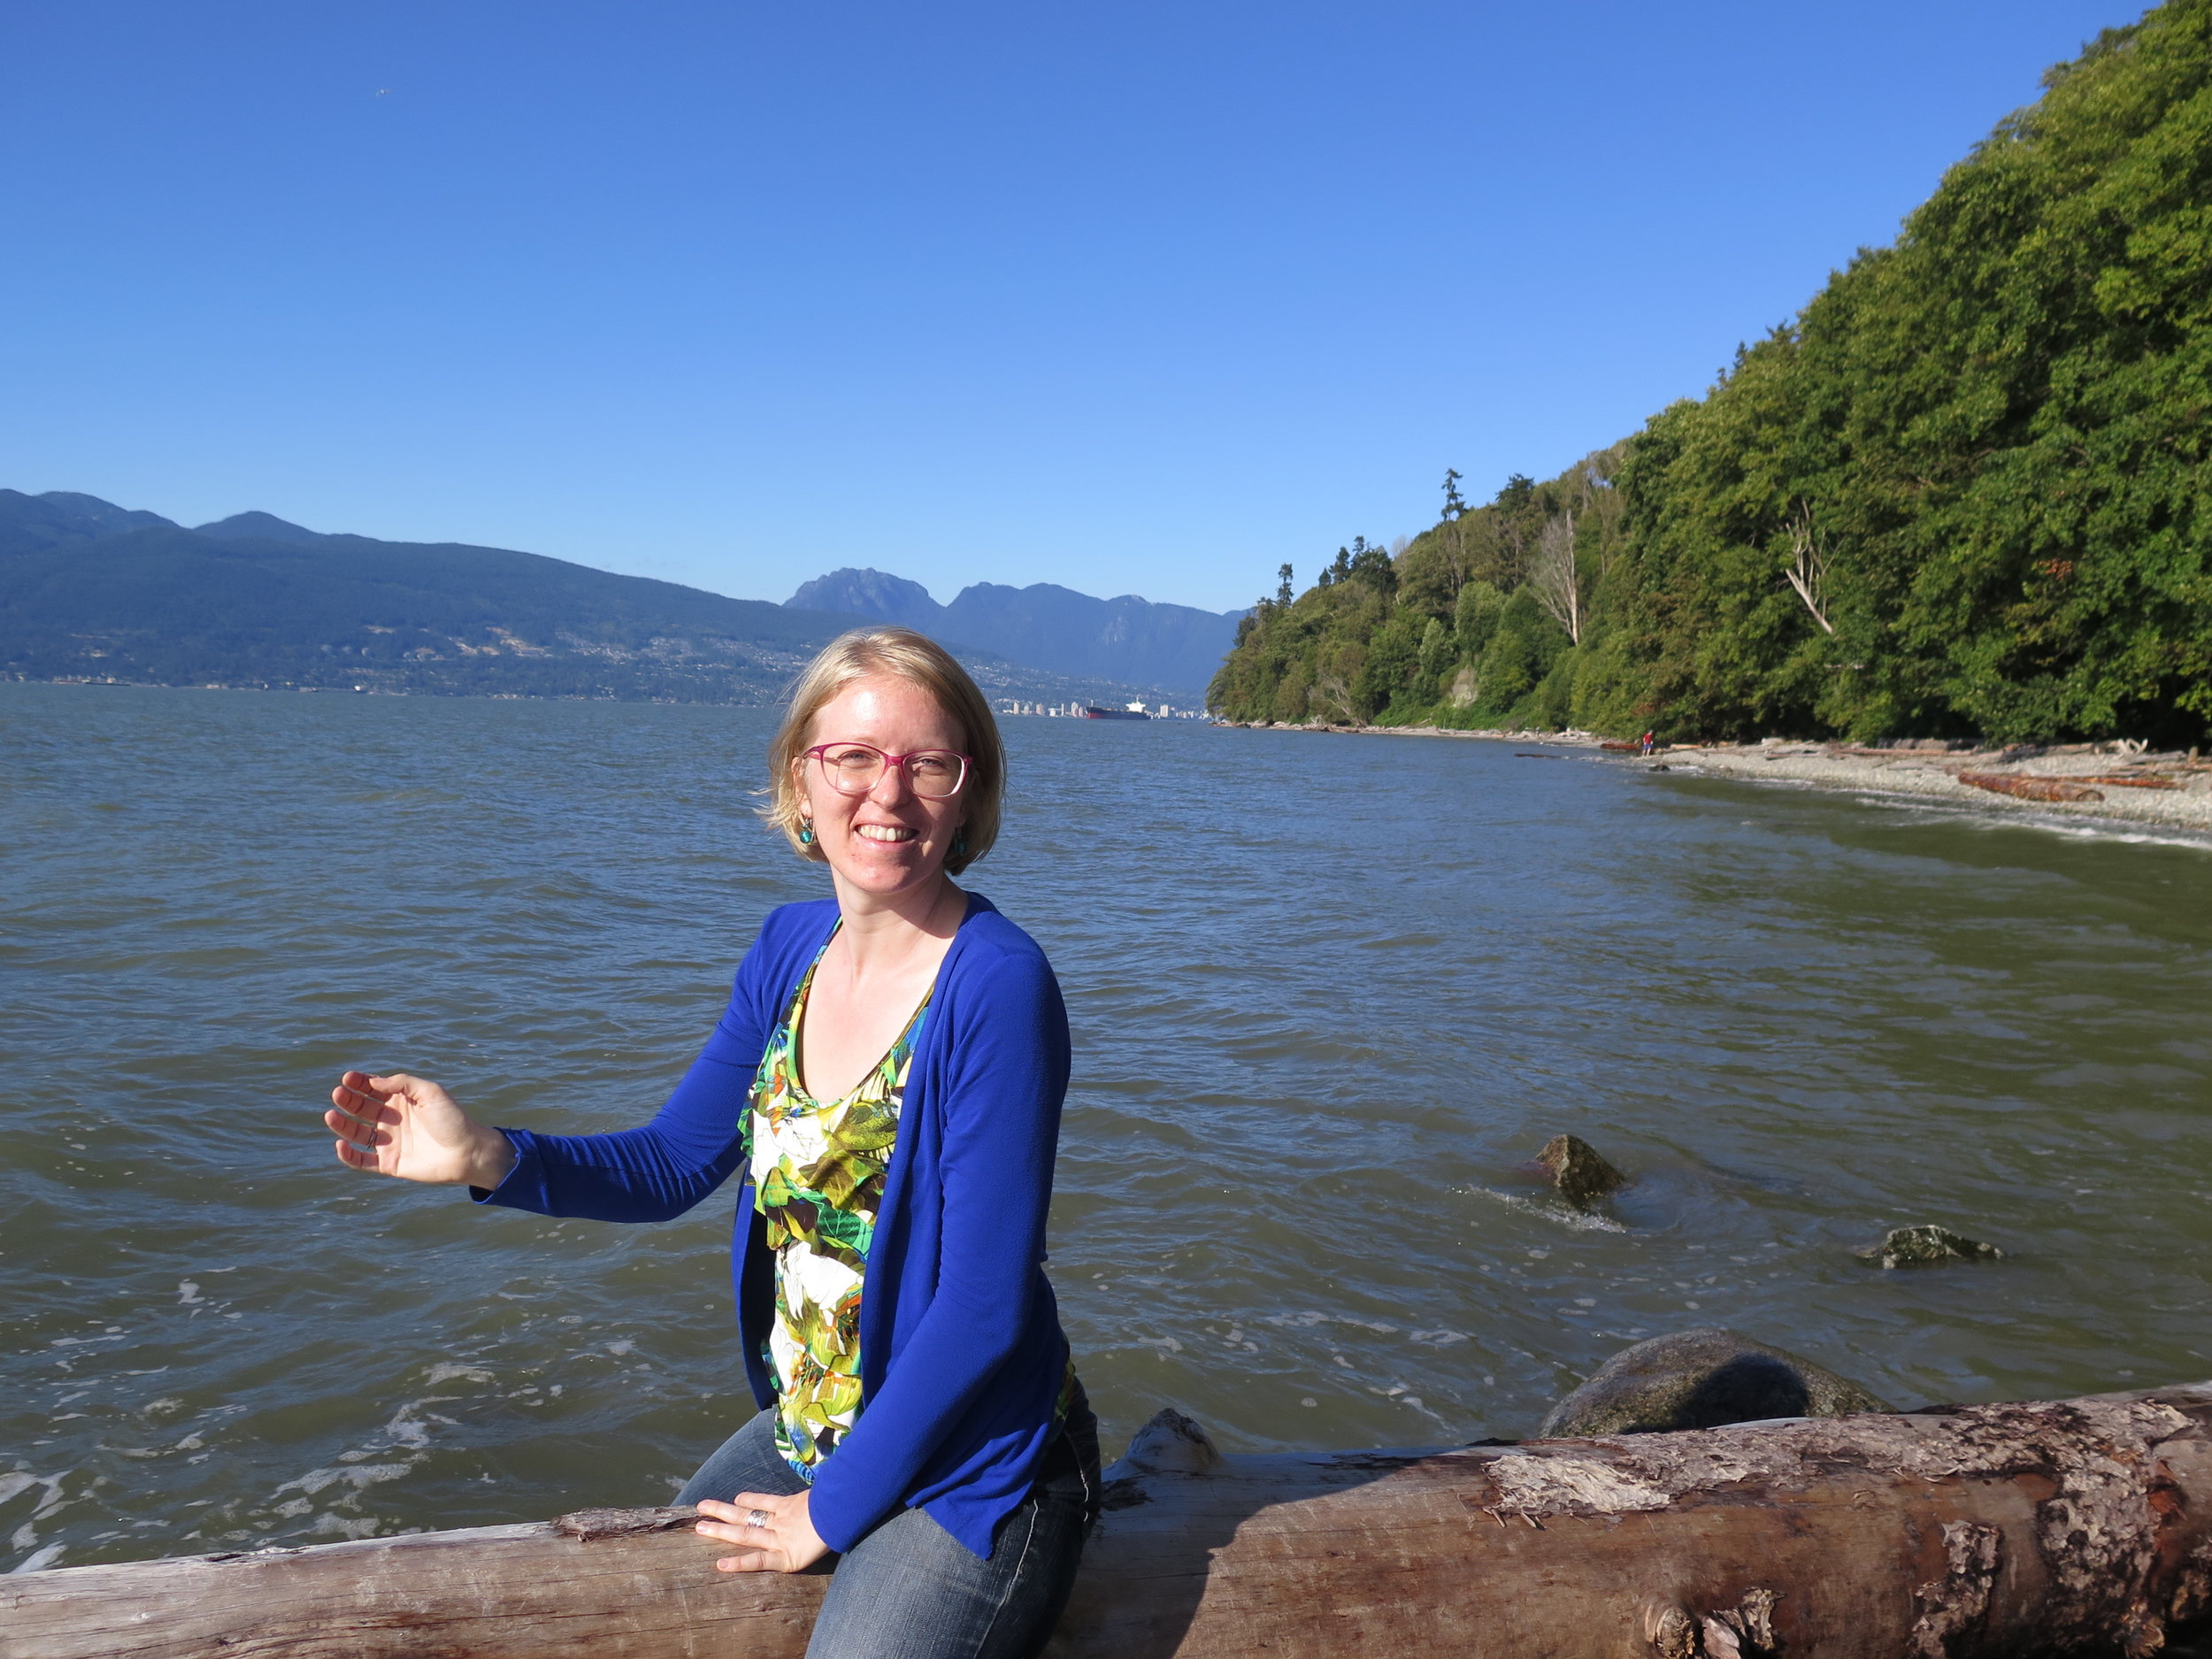 Feet dangling over the ocean at Wreck Beach in Vancouver, BC. (Photo: Michael Karenski)